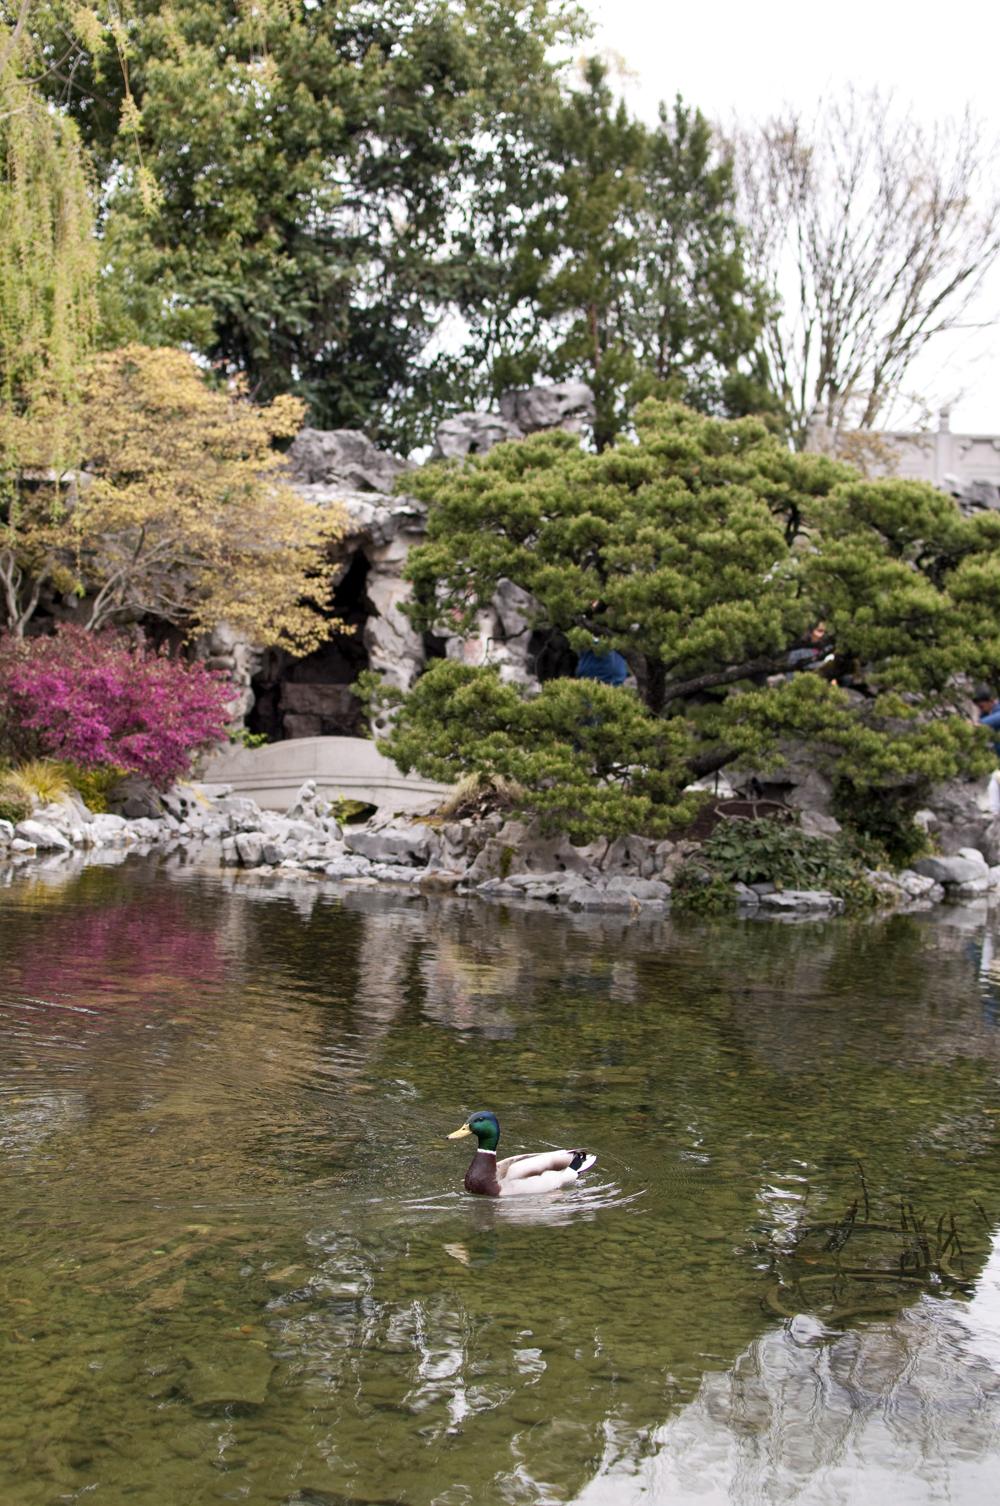 lan-su-garden-portland-oregon-08.jpg